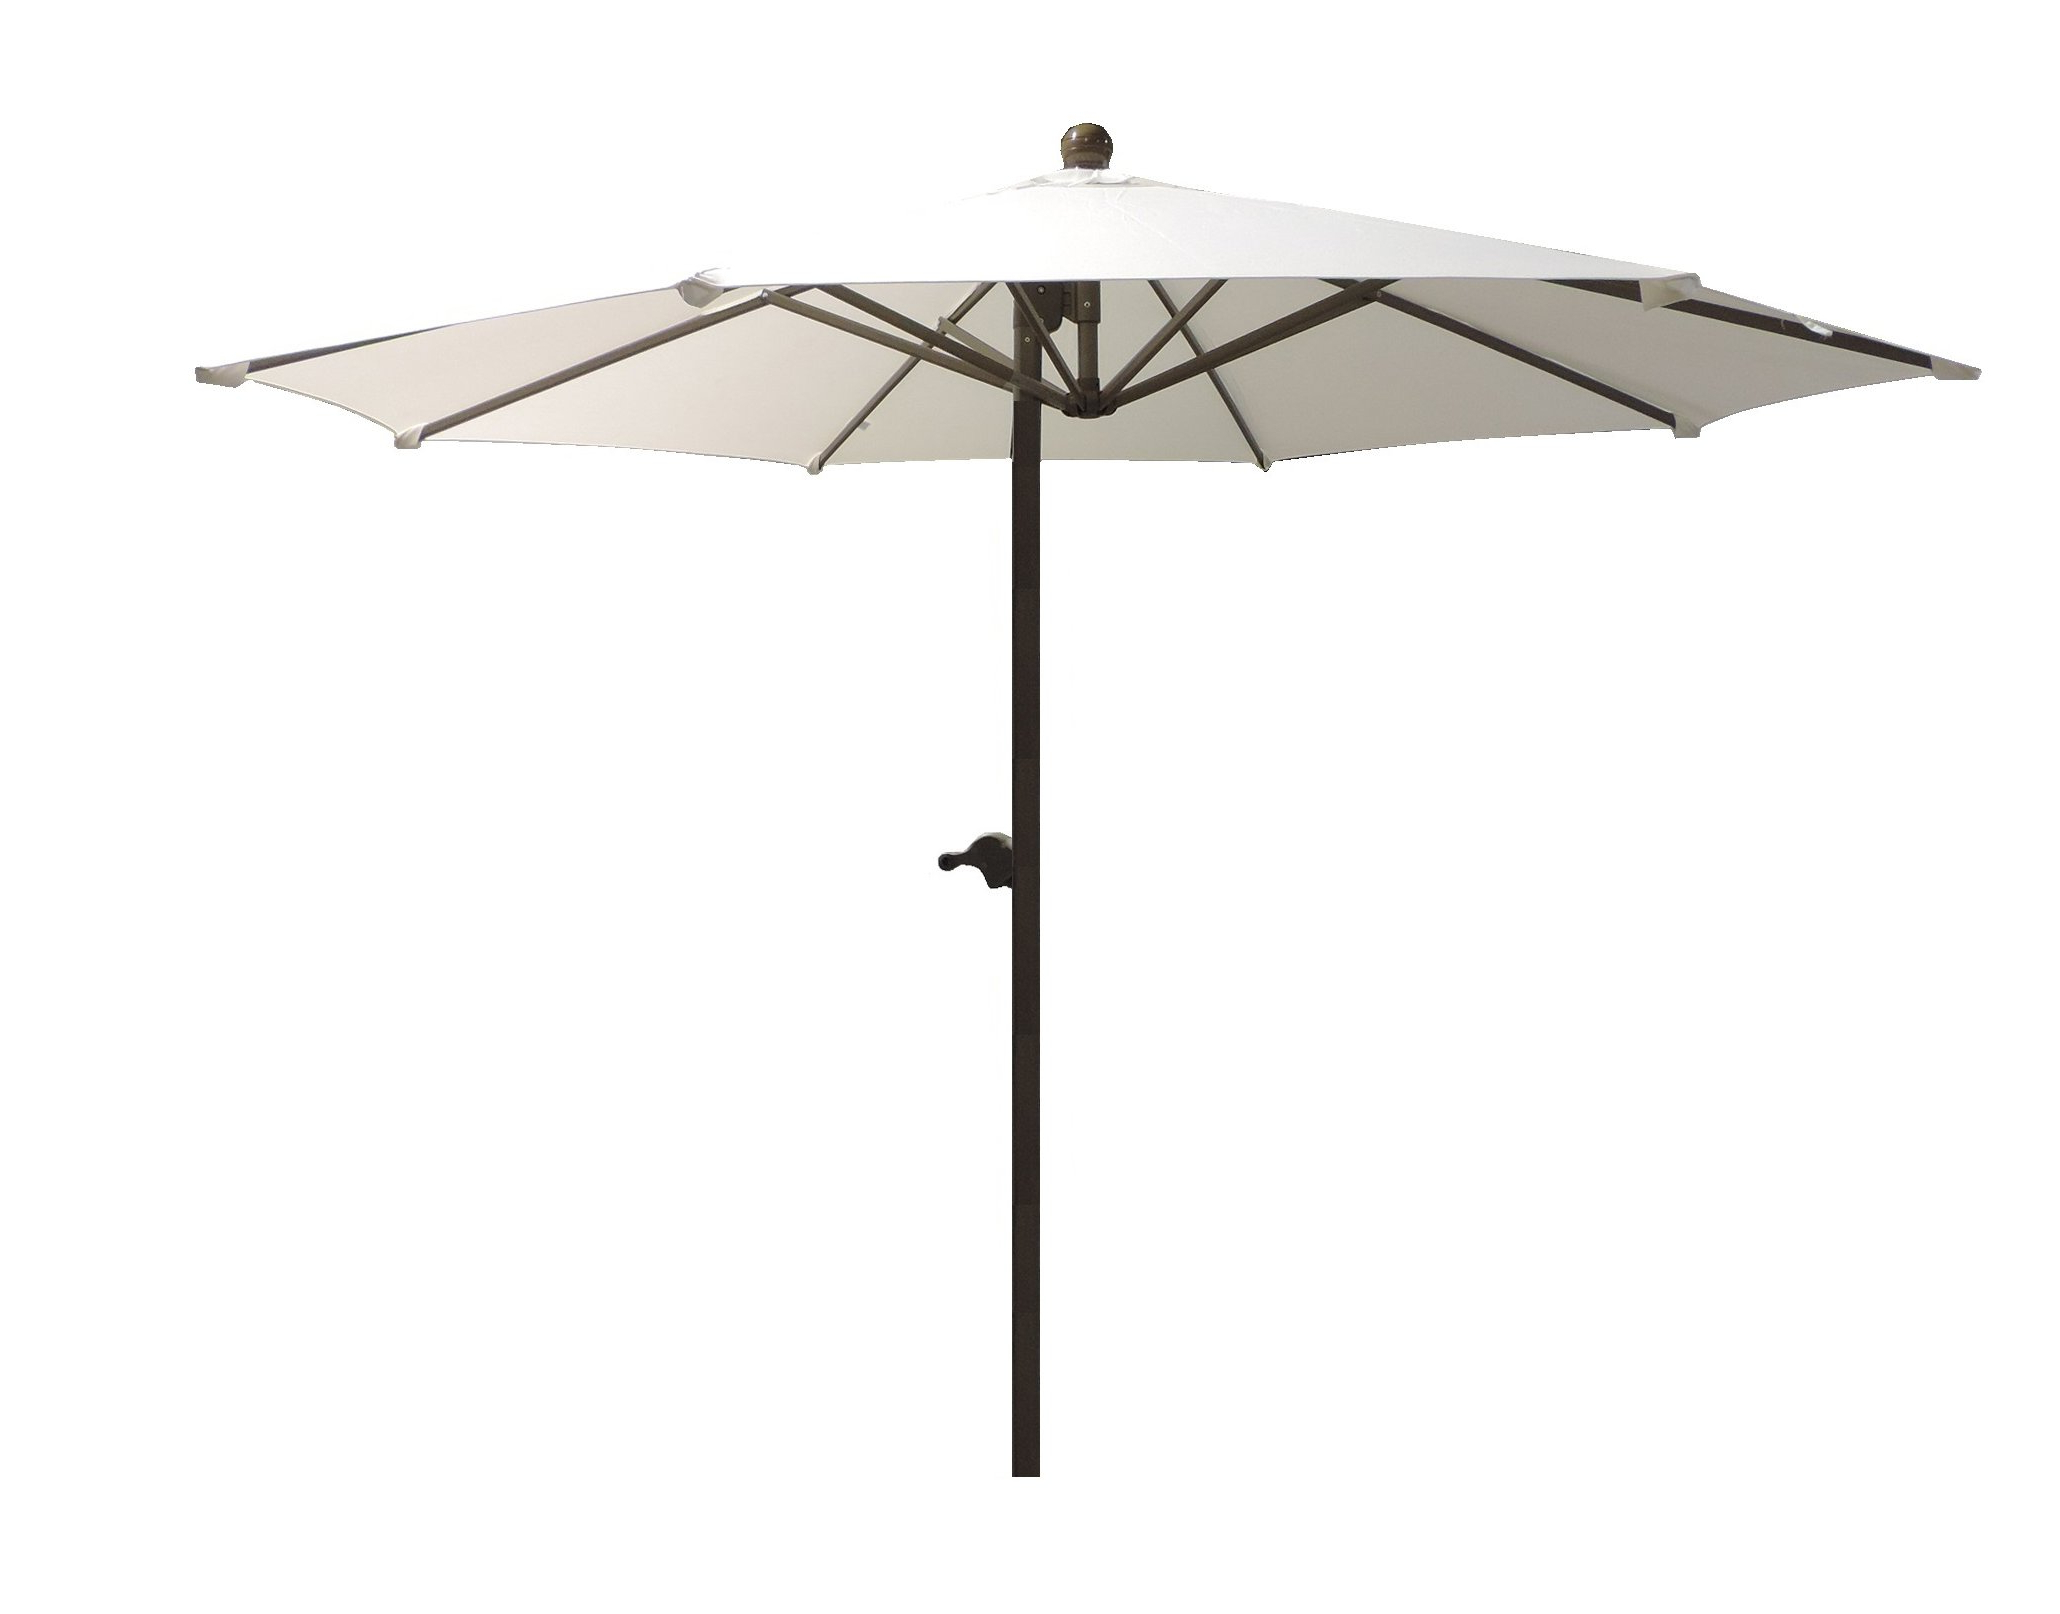 Leachville Market Umbrellas For 2019 Hogansville Dual Function Adjustable Offset 9' Market Umbrella (View 11 of 20)